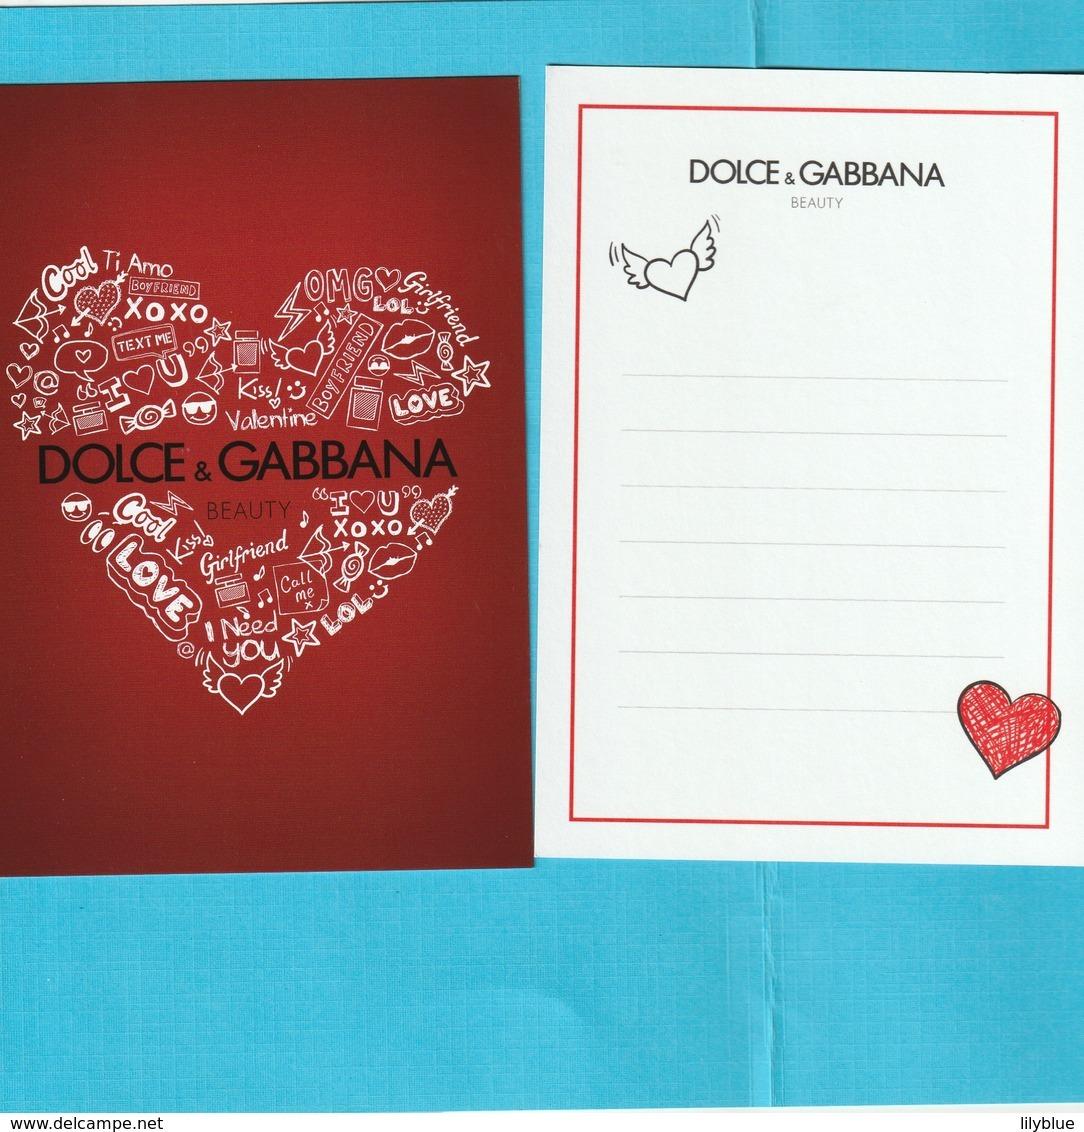 Dolce & Gabbana  Carte De St Valentin R/V - Cartes Parfumées